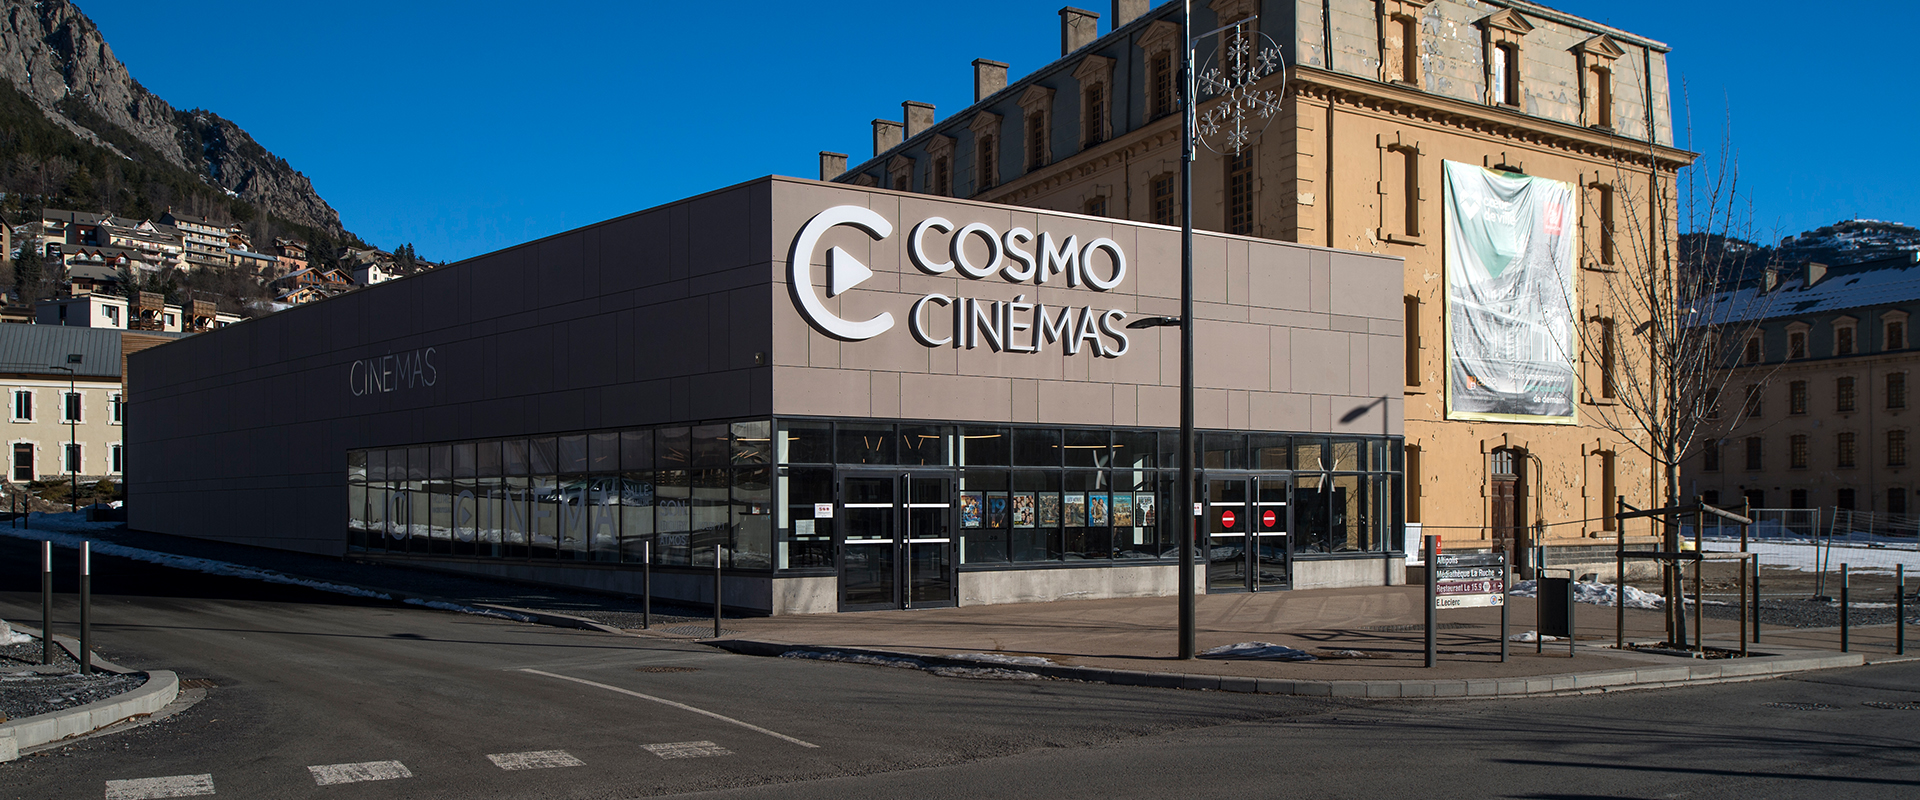 Cinema Cosmo